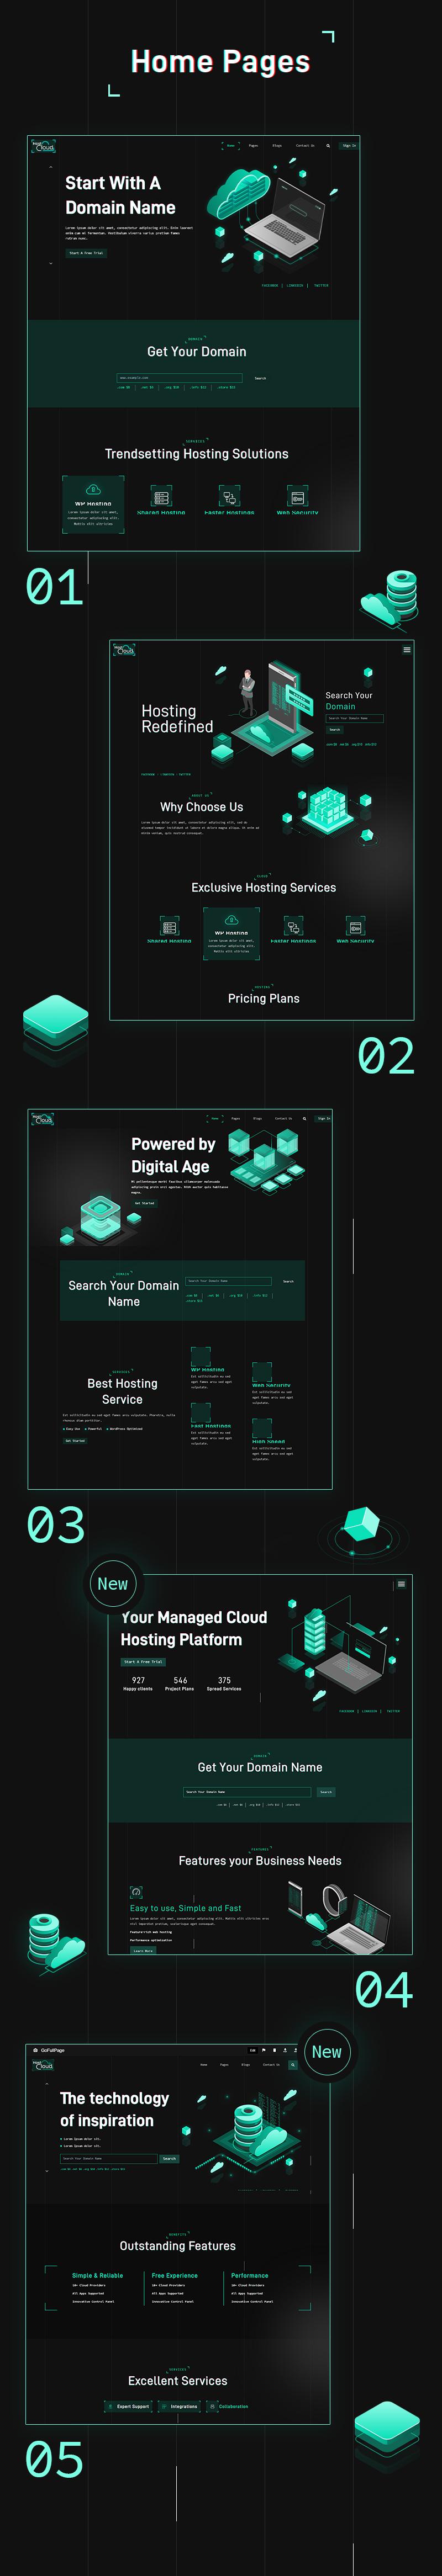 HostCloud | Hosting Server & Tech WordPress theme - 7